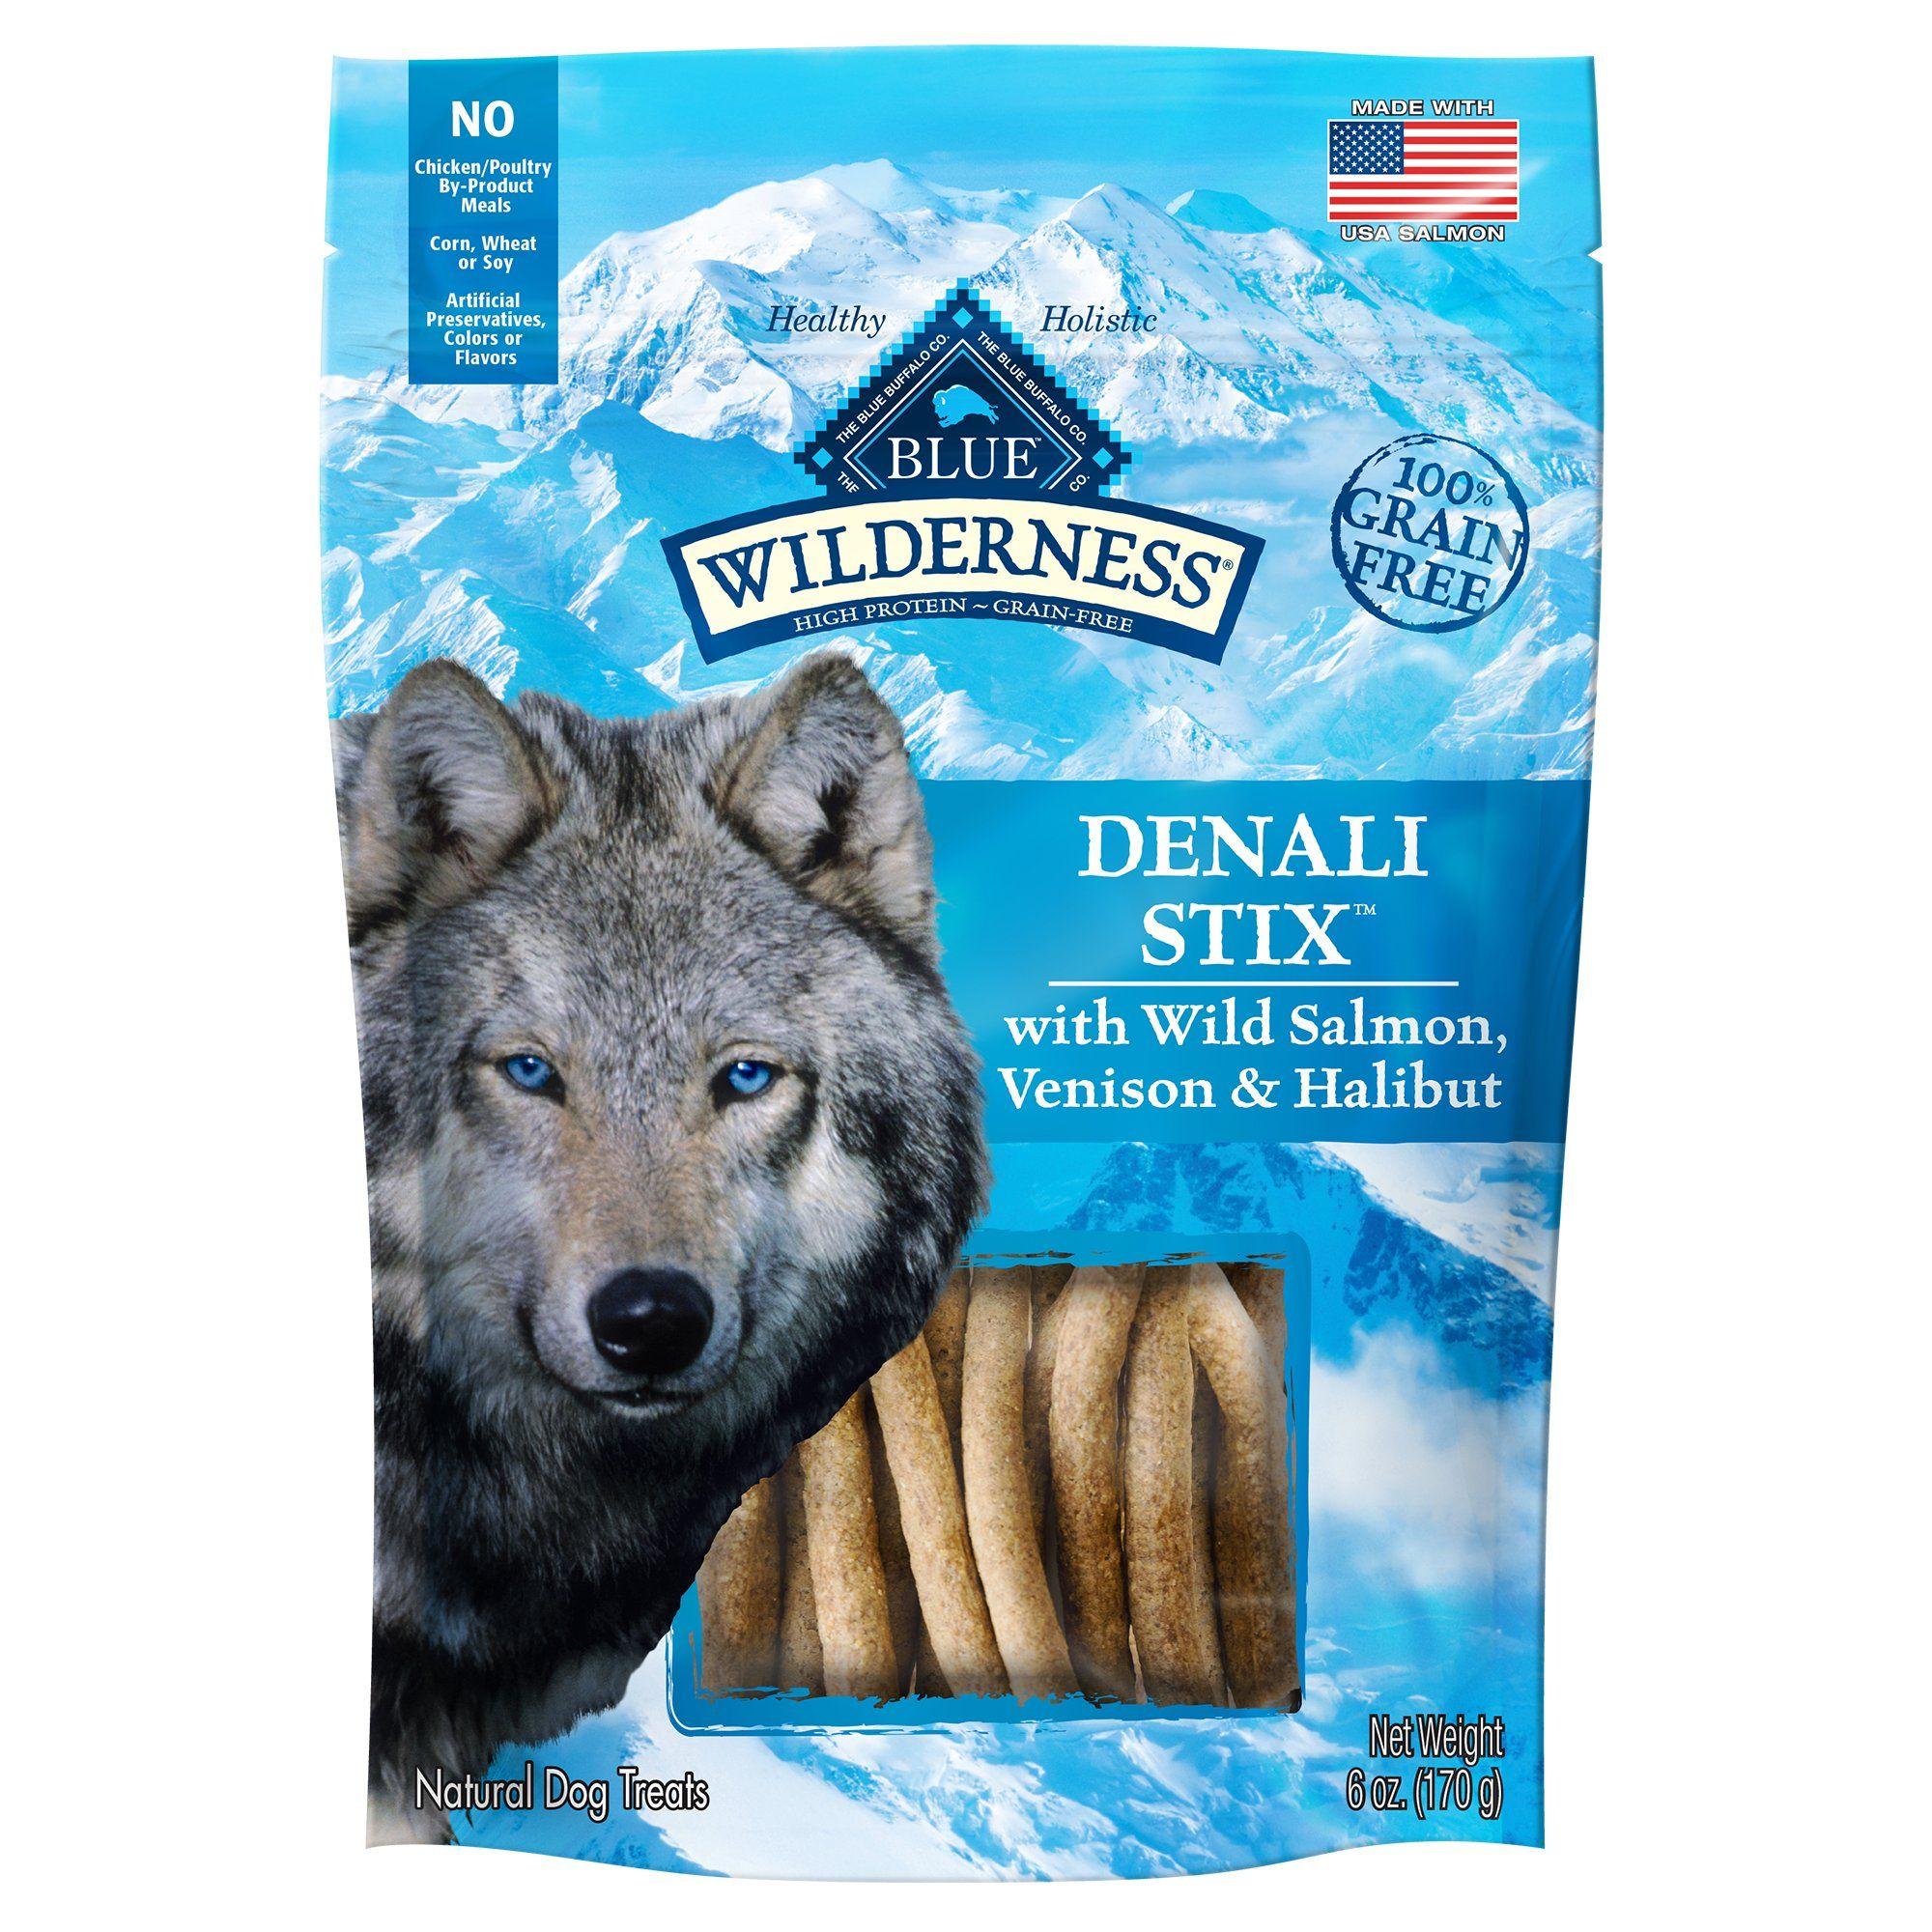 Blue Buffalo Blue Wilderness Denali Dinner Stix Dog Treats 6 Oz Petco Natural Dog Treats Blue Buffalo Dog Treats